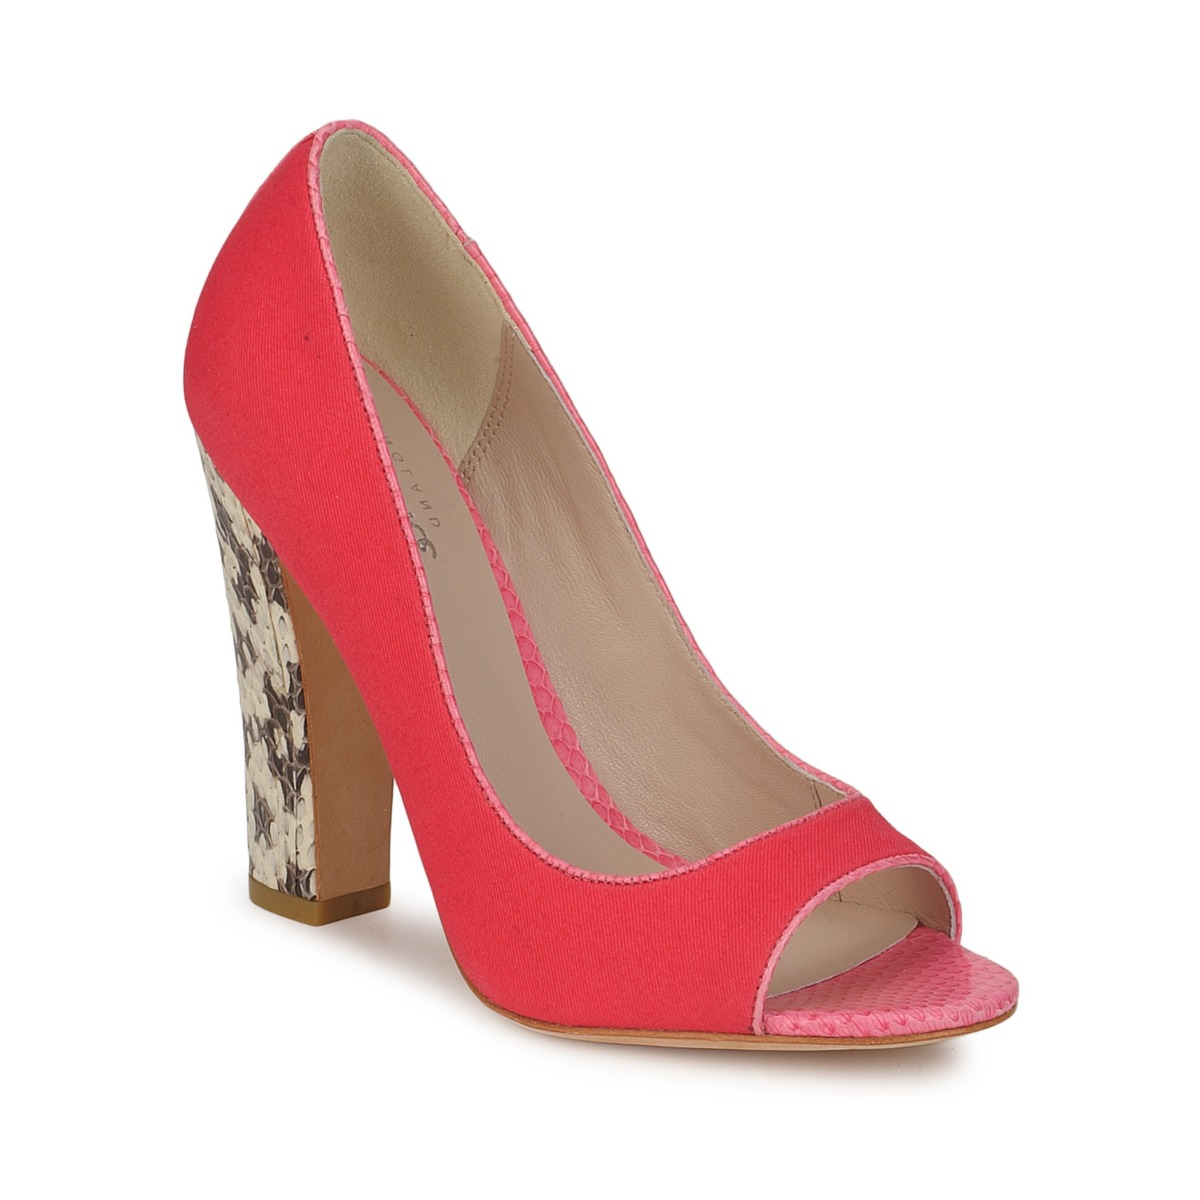 Bourne FRANCESCA Korallenrot - Kostenloser Versand bei Spartoode ! - Schuhe Pumps Damen 112,50 €